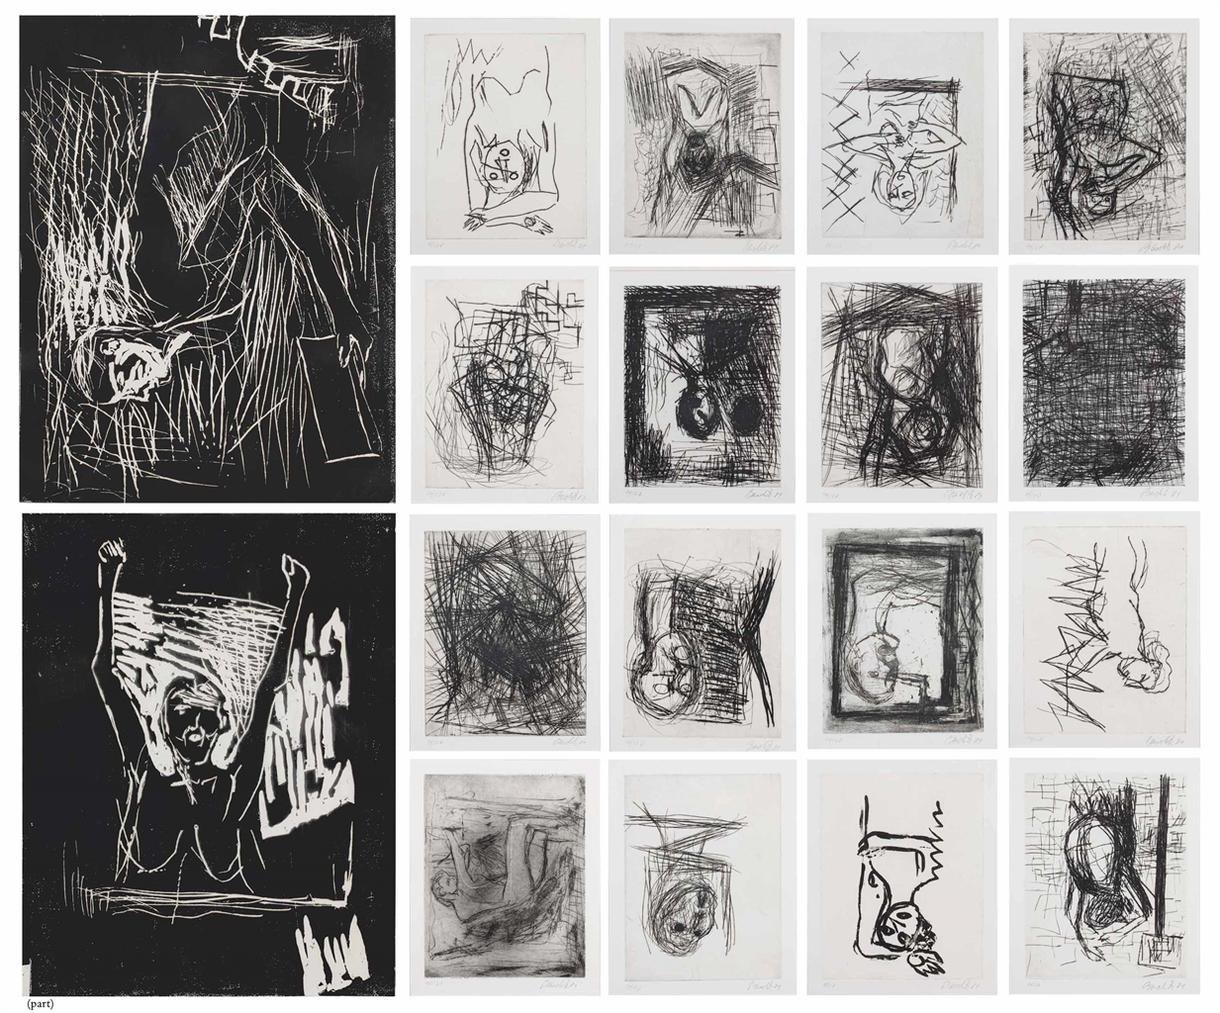 Georg Baselitz-Das Strassenbild (The Streetscape)-1981